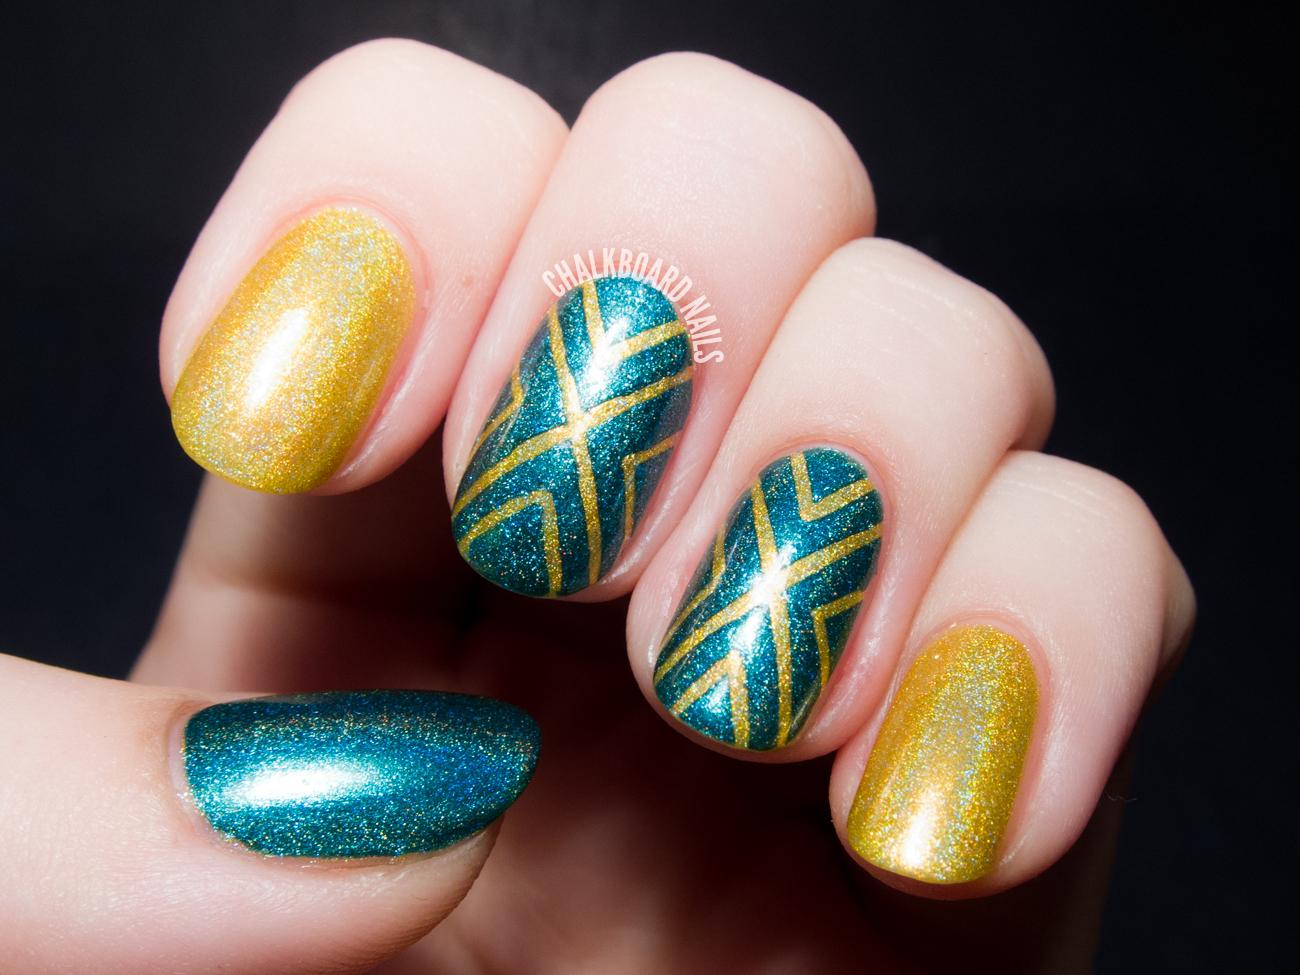 Converging Chevrons A Holographic Tape Manicure Chalkboard Nails Phoenix Arizona Nail Artist